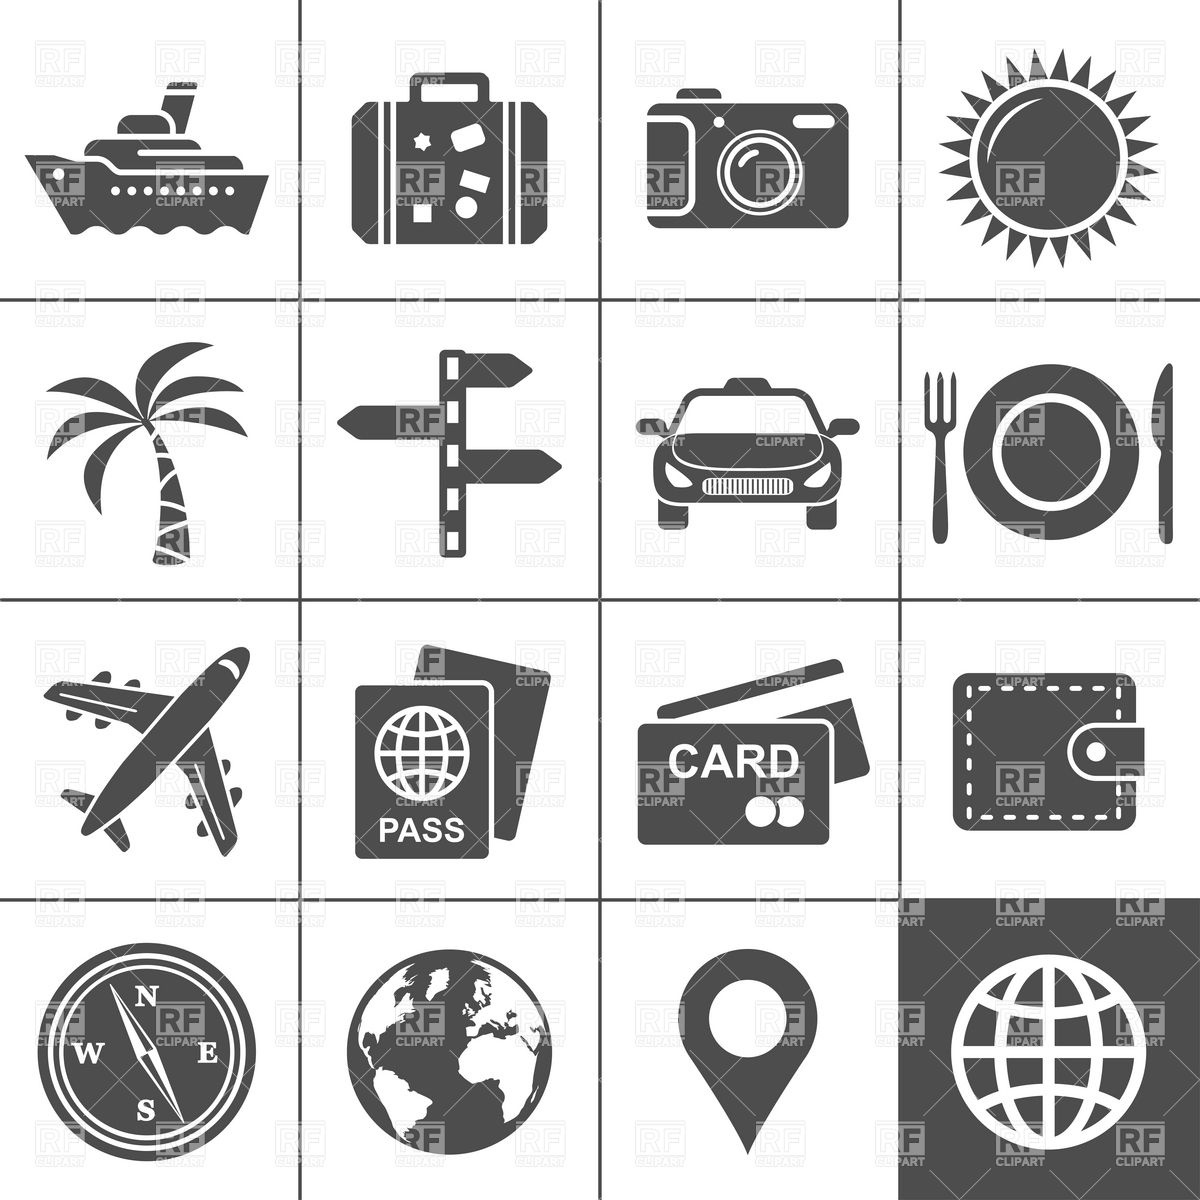 17 Icons Travel Symbols Images.